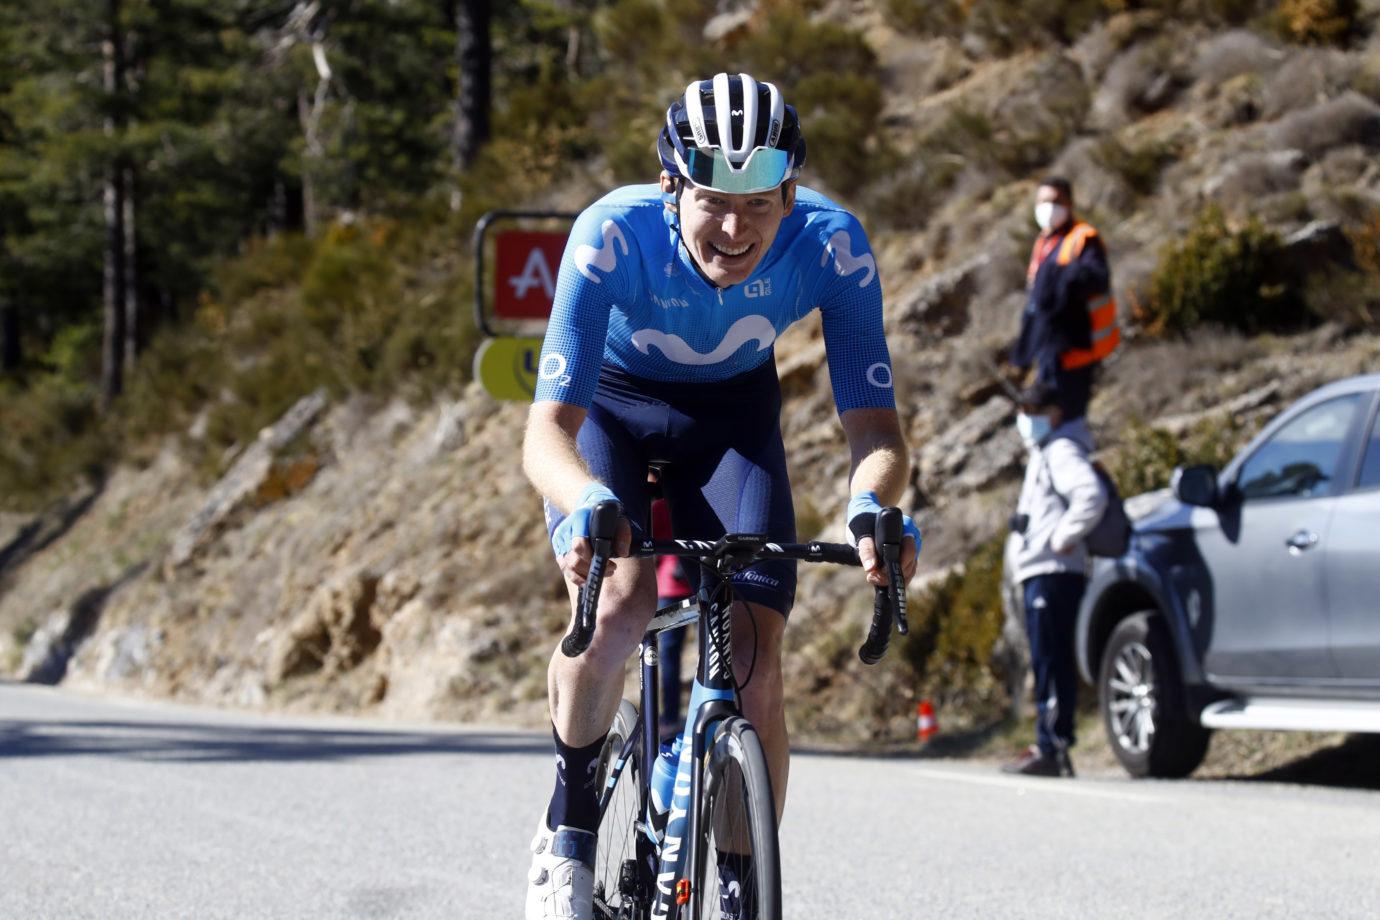 Imagen de la noticia 'Jorgenson still within overall top-ten after La Colmiane climb'